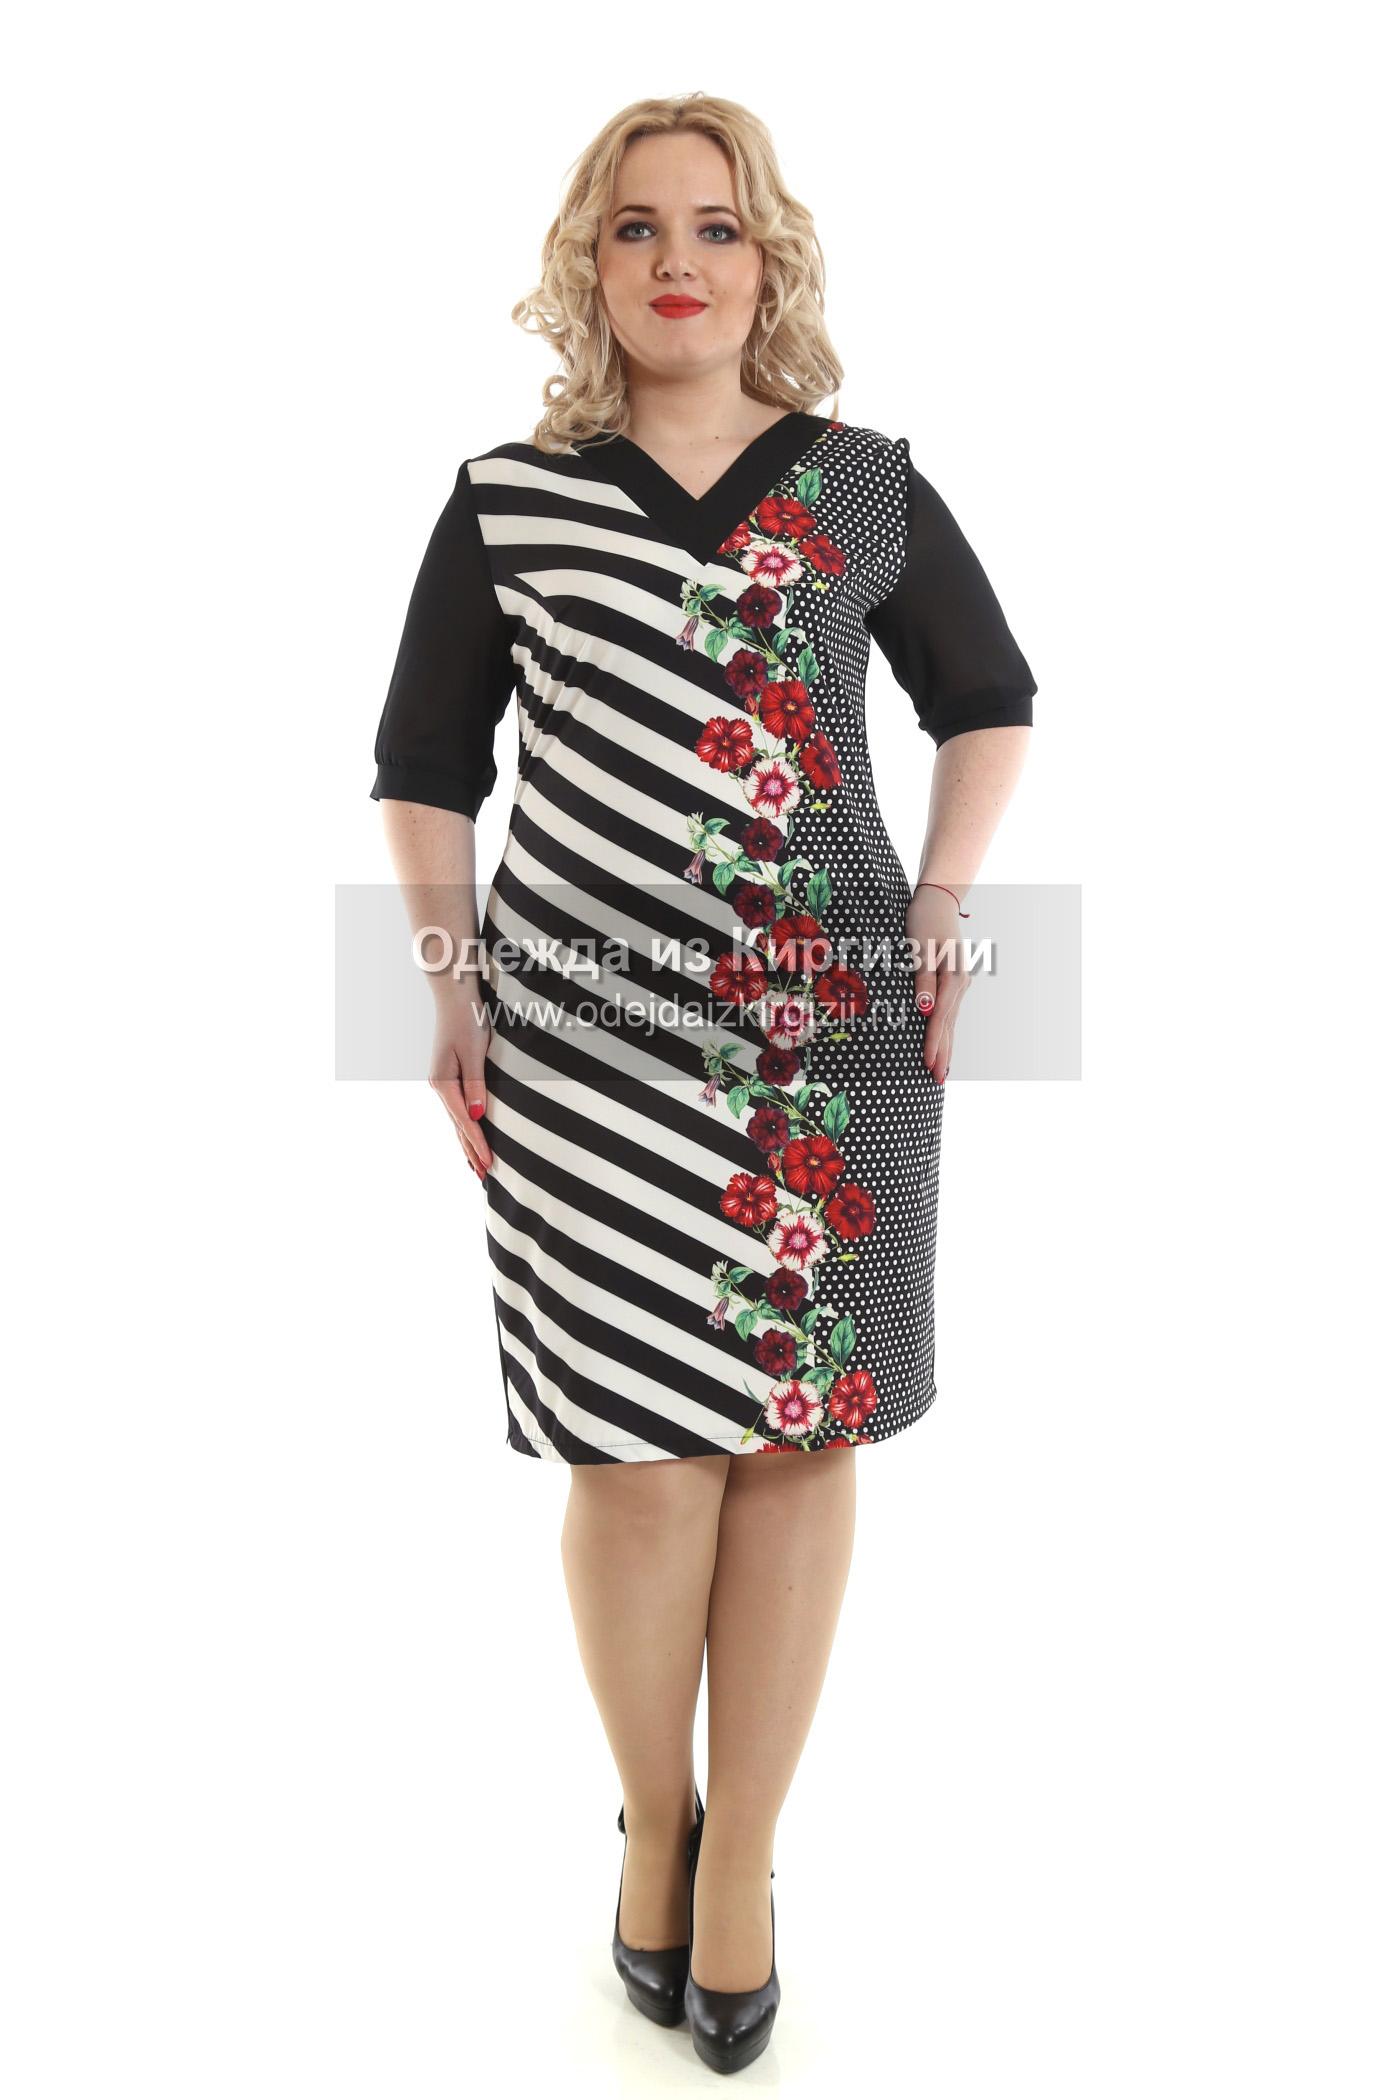 Платье MZO-Мысик полоска-02